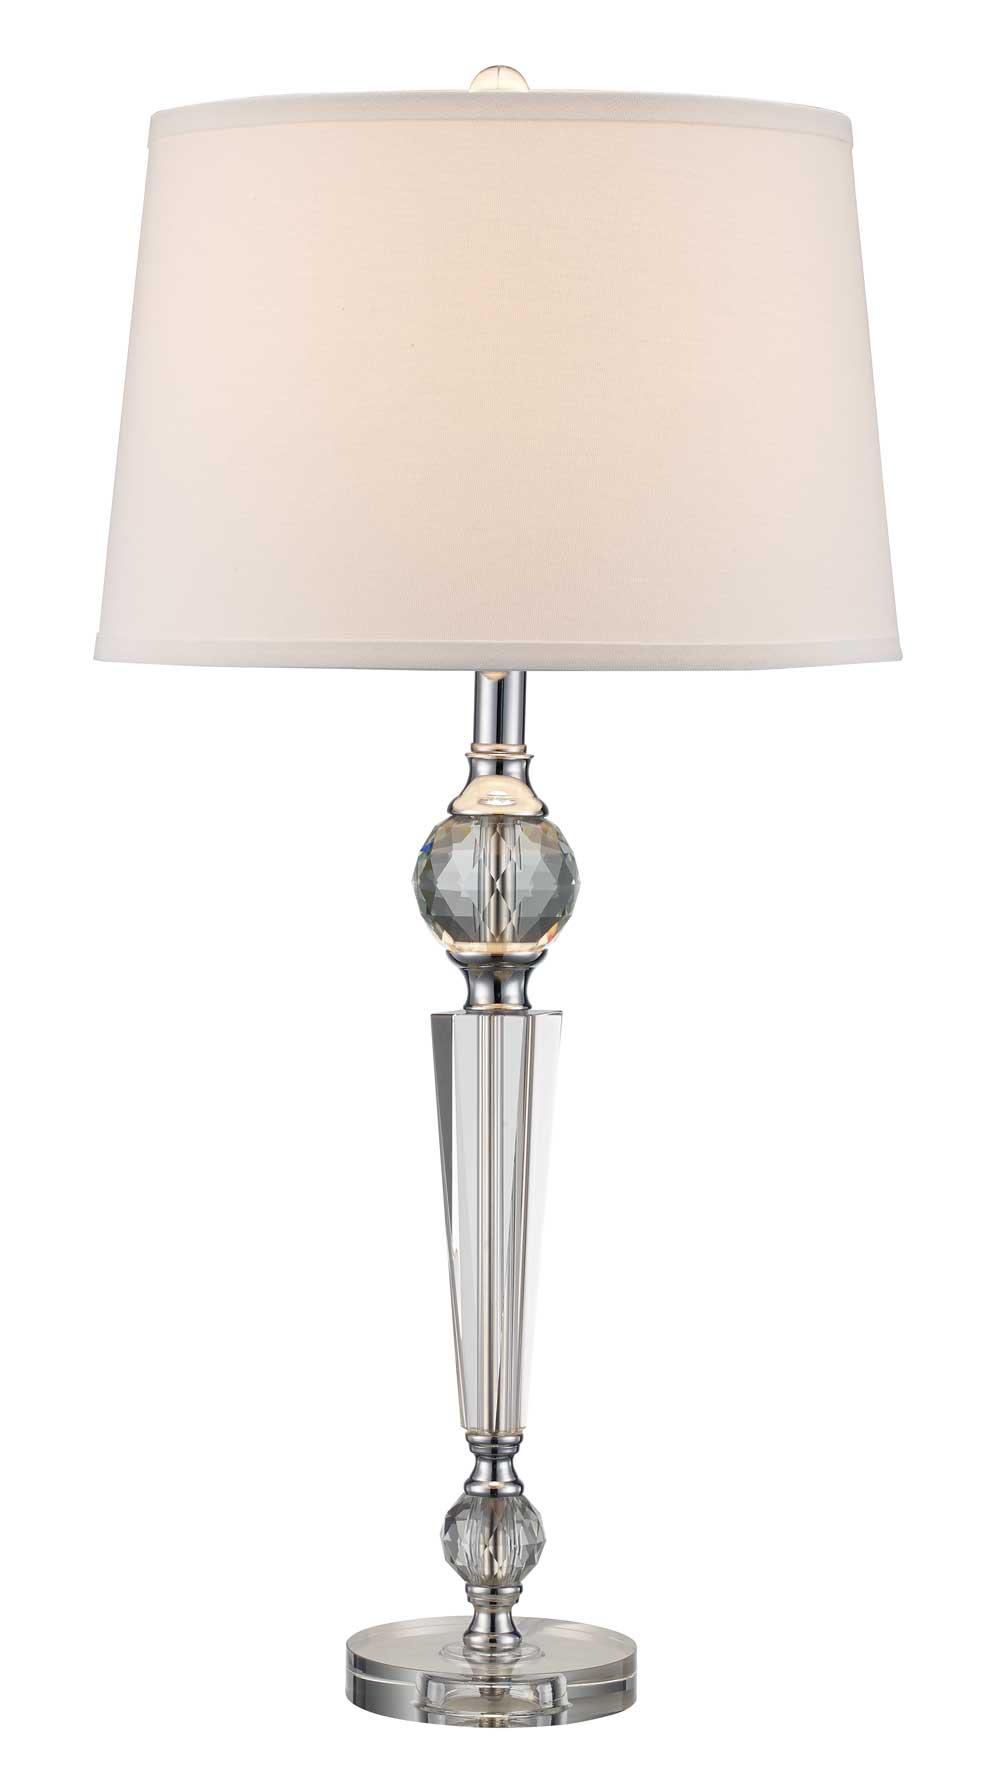 Trans Globe Lighting CTL-597